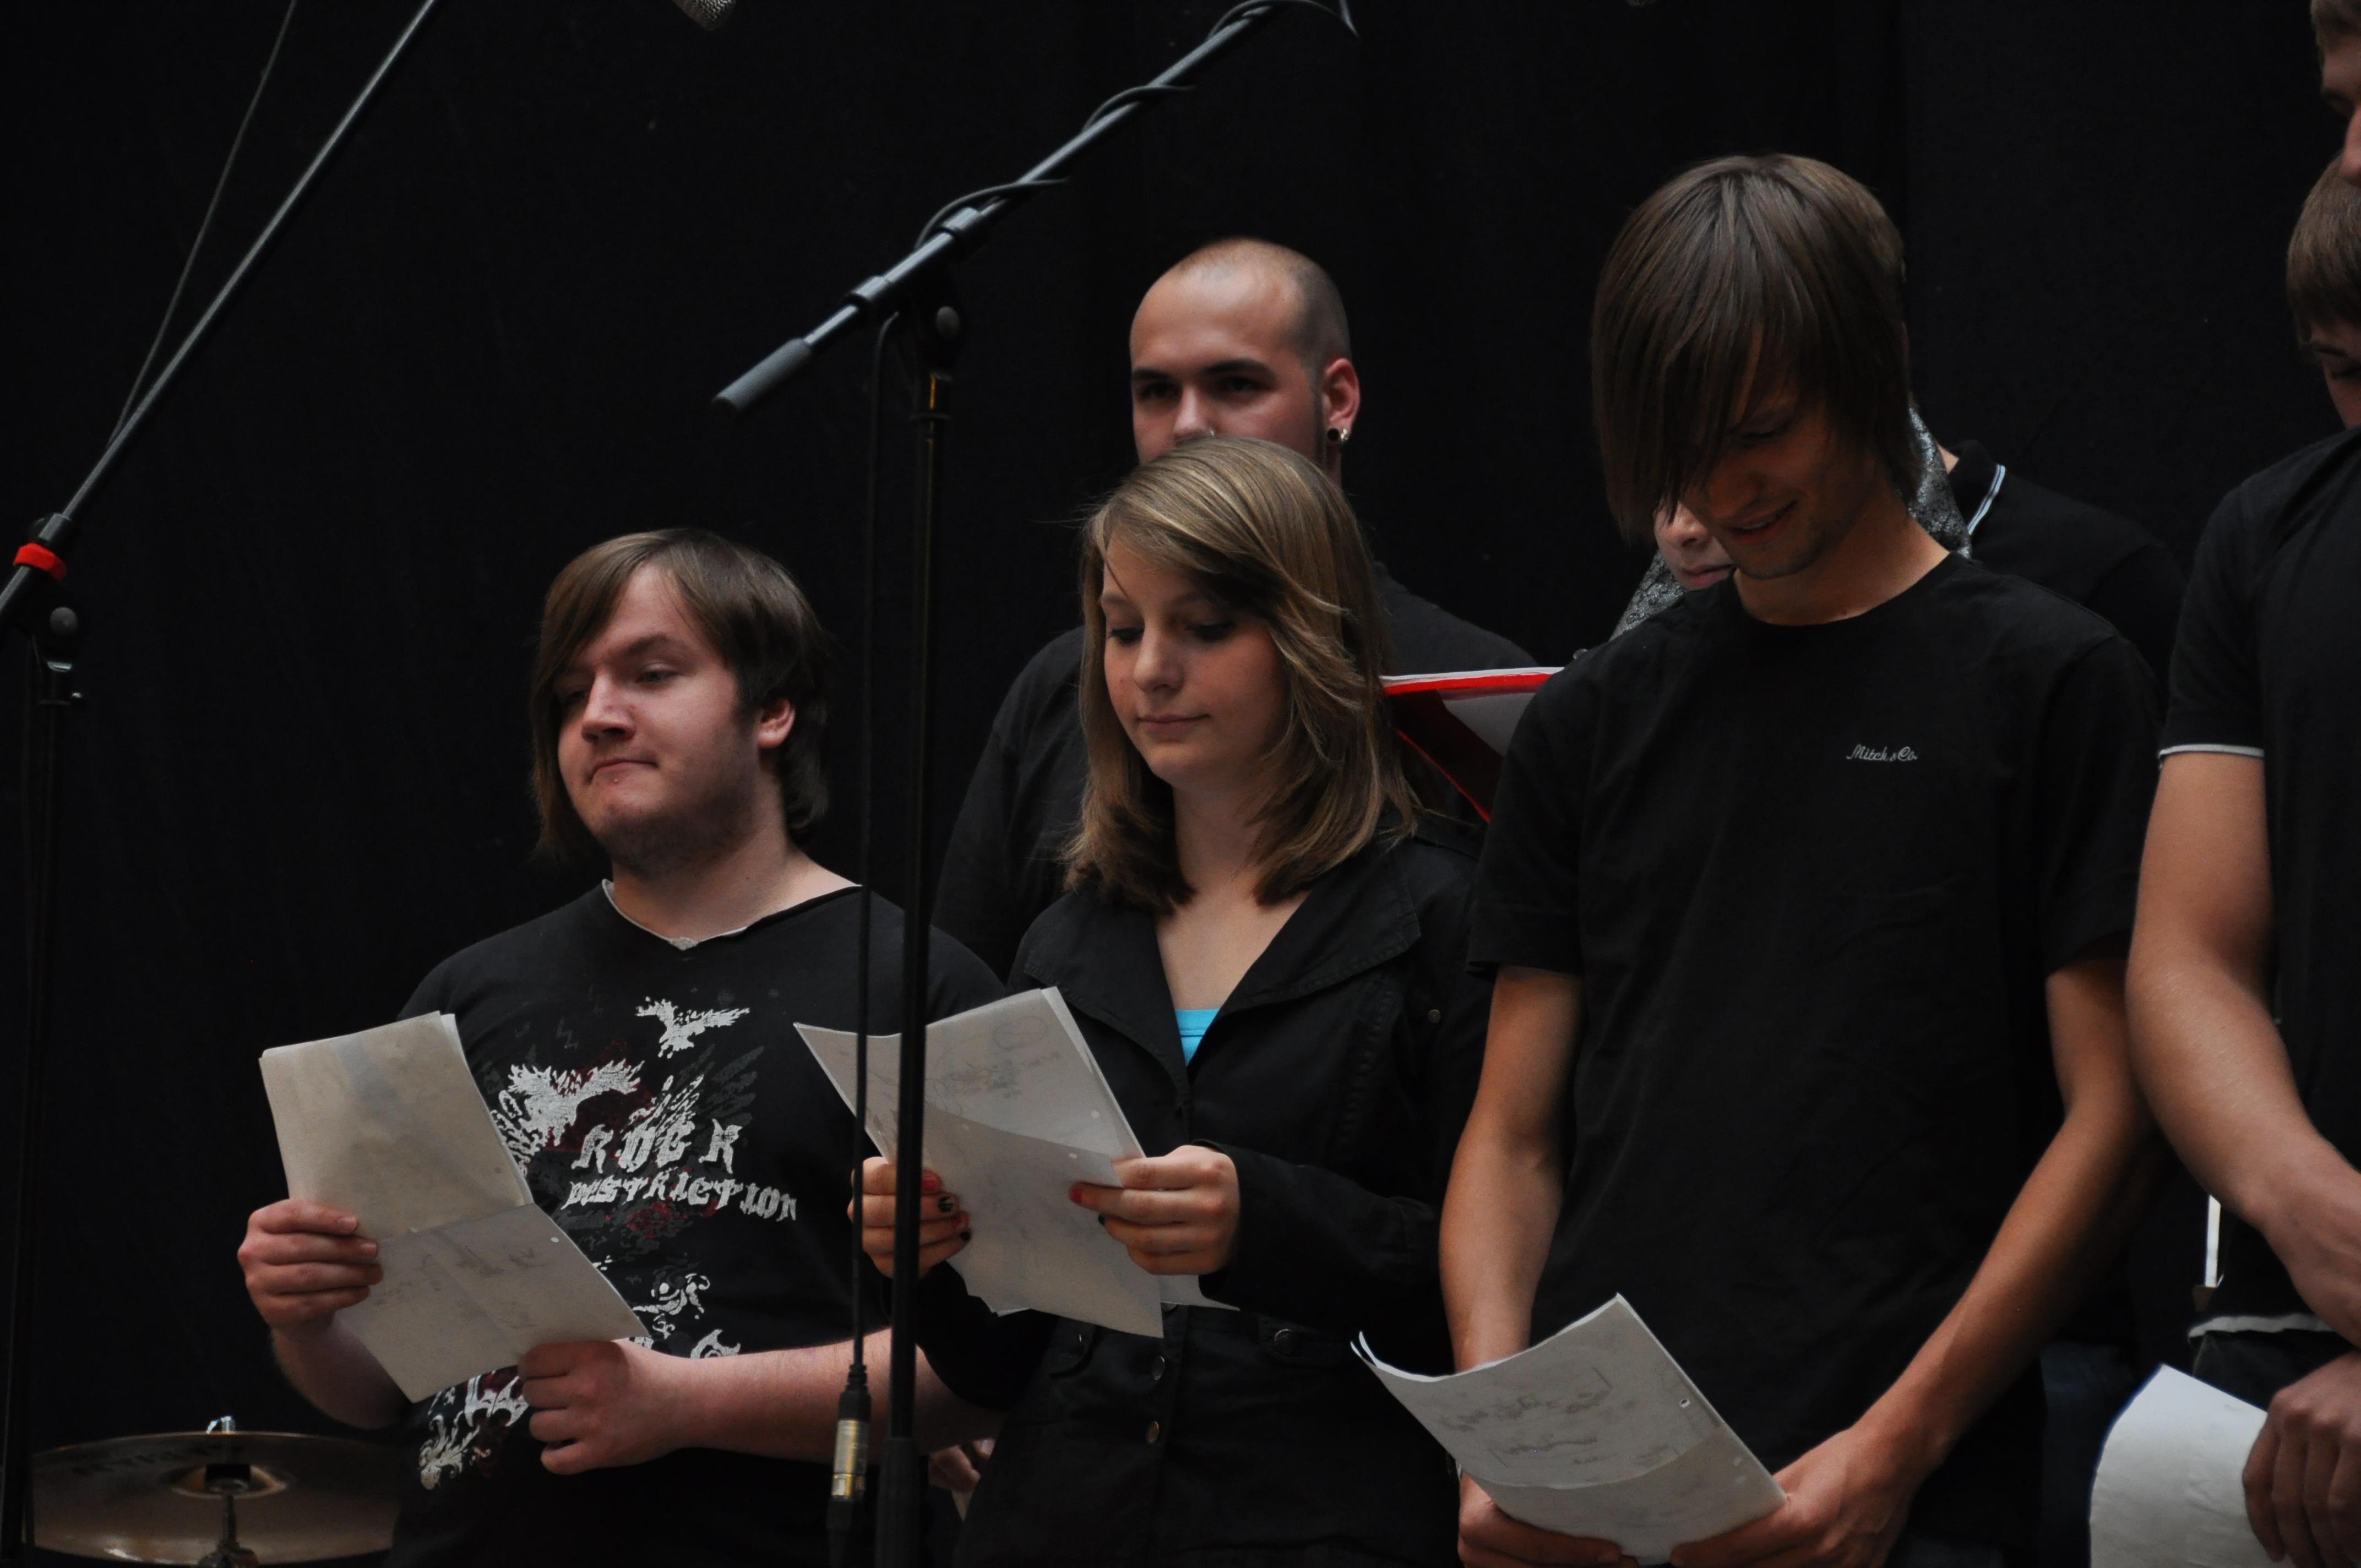 08.06.2011_Querbeat (12)